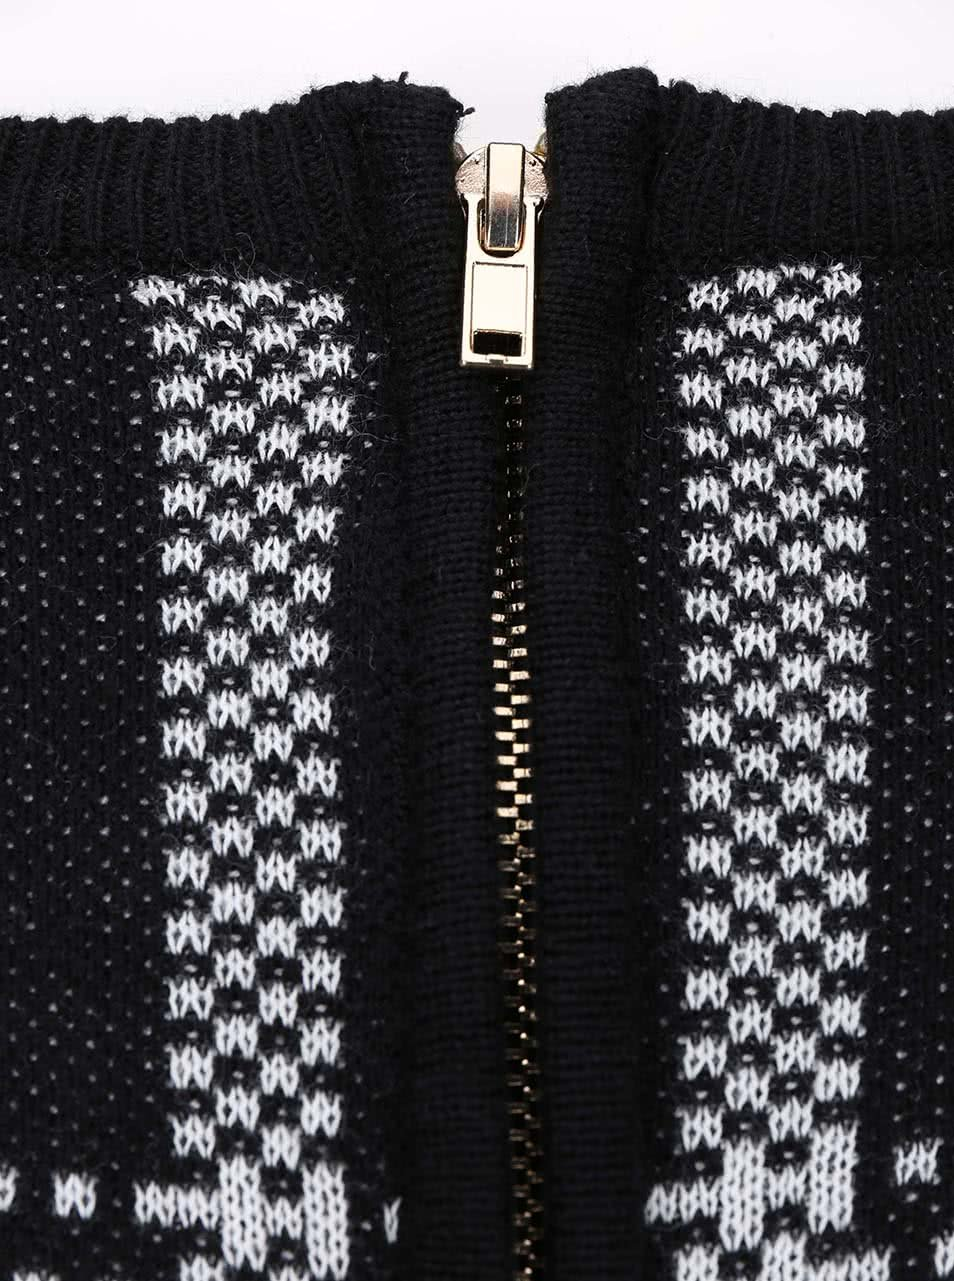 cdddc712c Bielo-čierne pletené šaty s 3/4 rukávmi Dorothy Perkins | ZOOT.sk